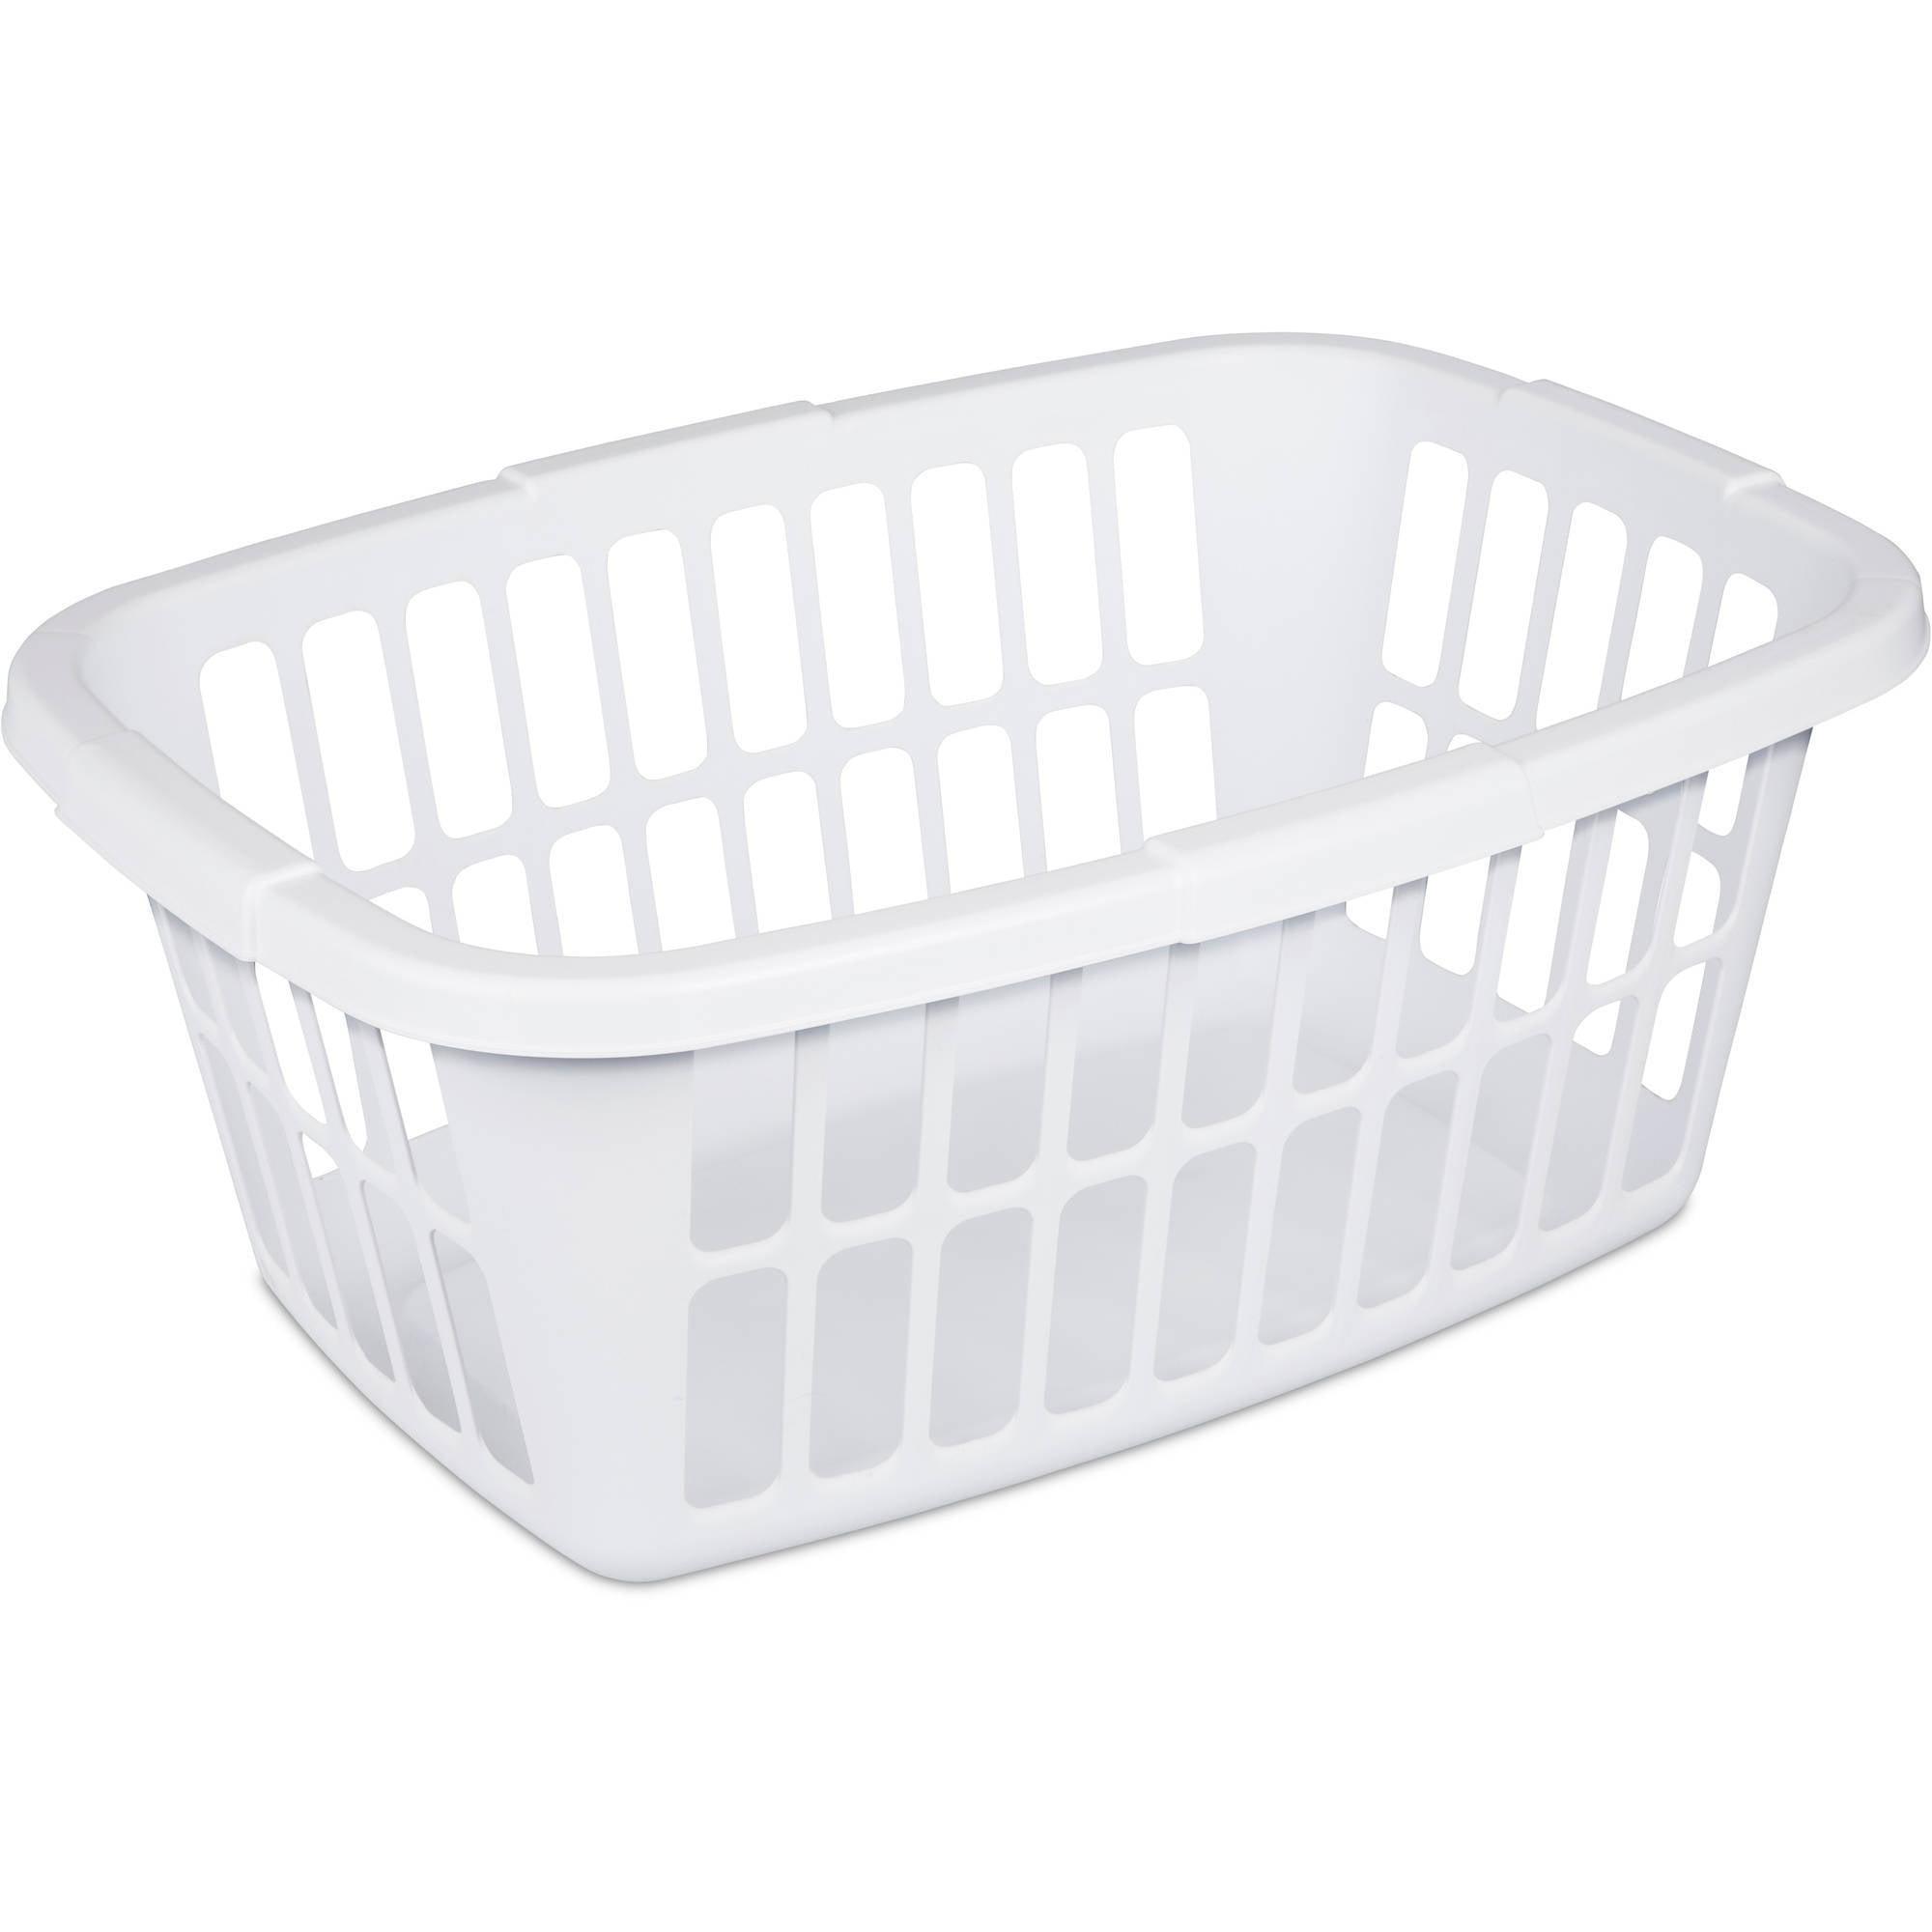 Mainstays 1.5 Bushel Laundry Basket- White, (Available in Case of 12 or Single Unit)